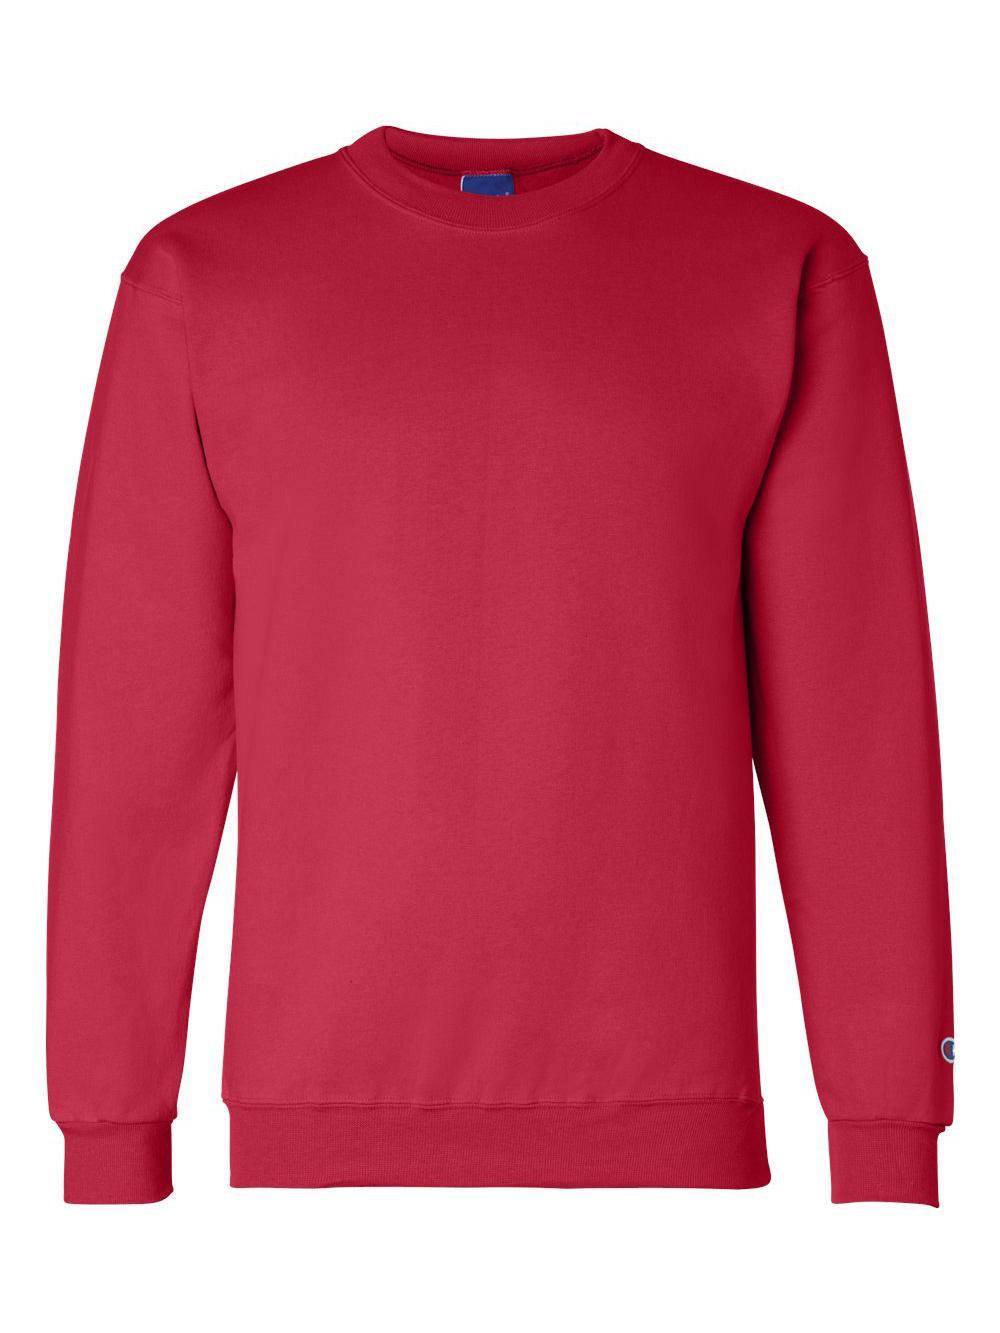 Champion-Double-Dry-Eco-Crewneck-Sweatshirt-S600 thumbnail 27